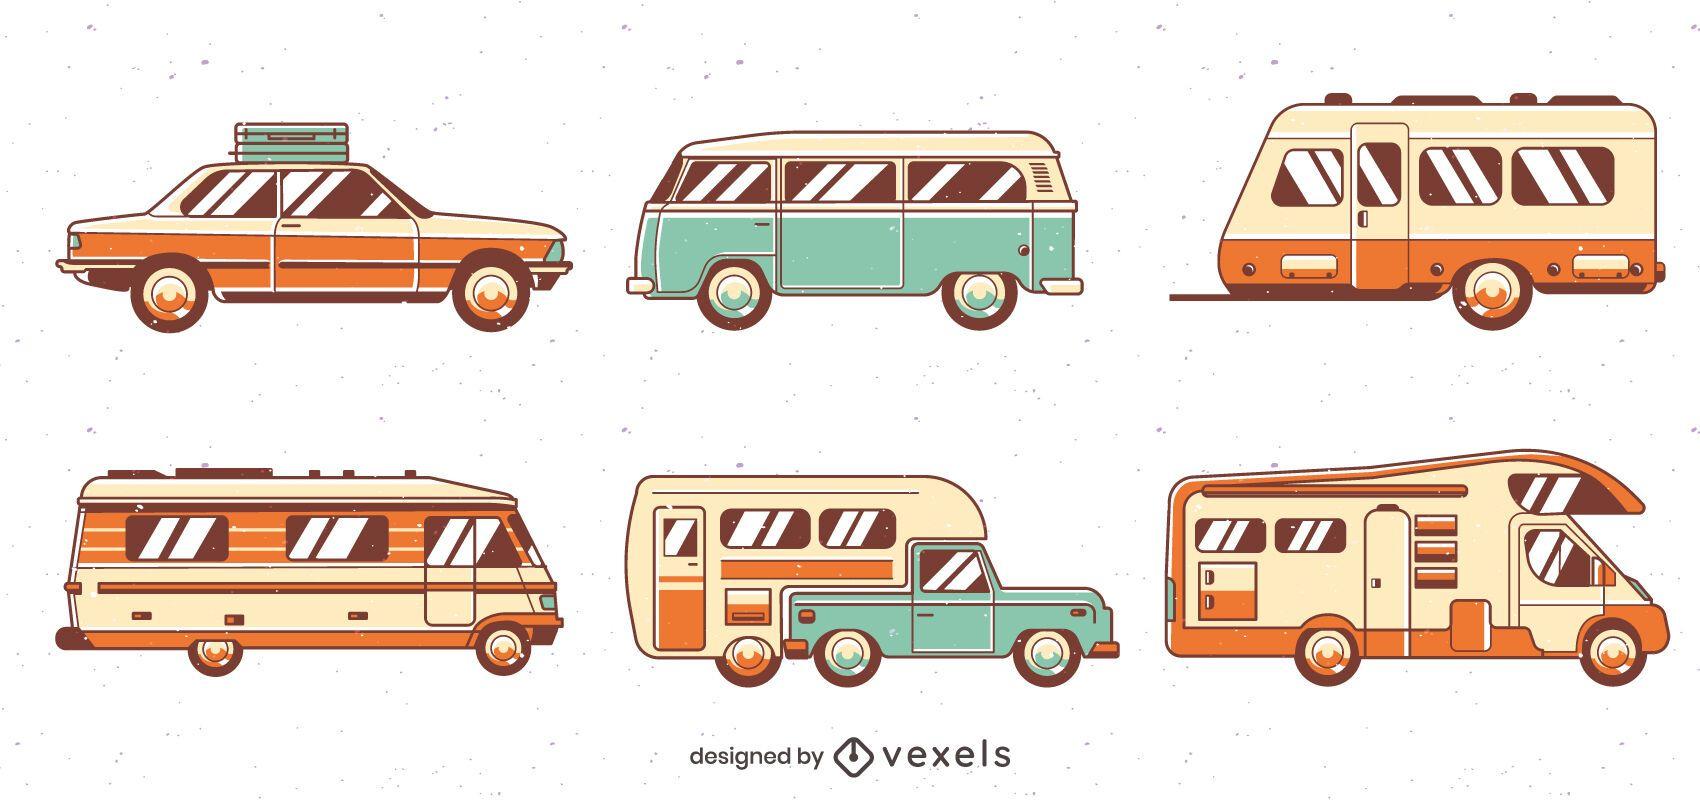 Pacote de veículos para viagens rodoviárias vintage